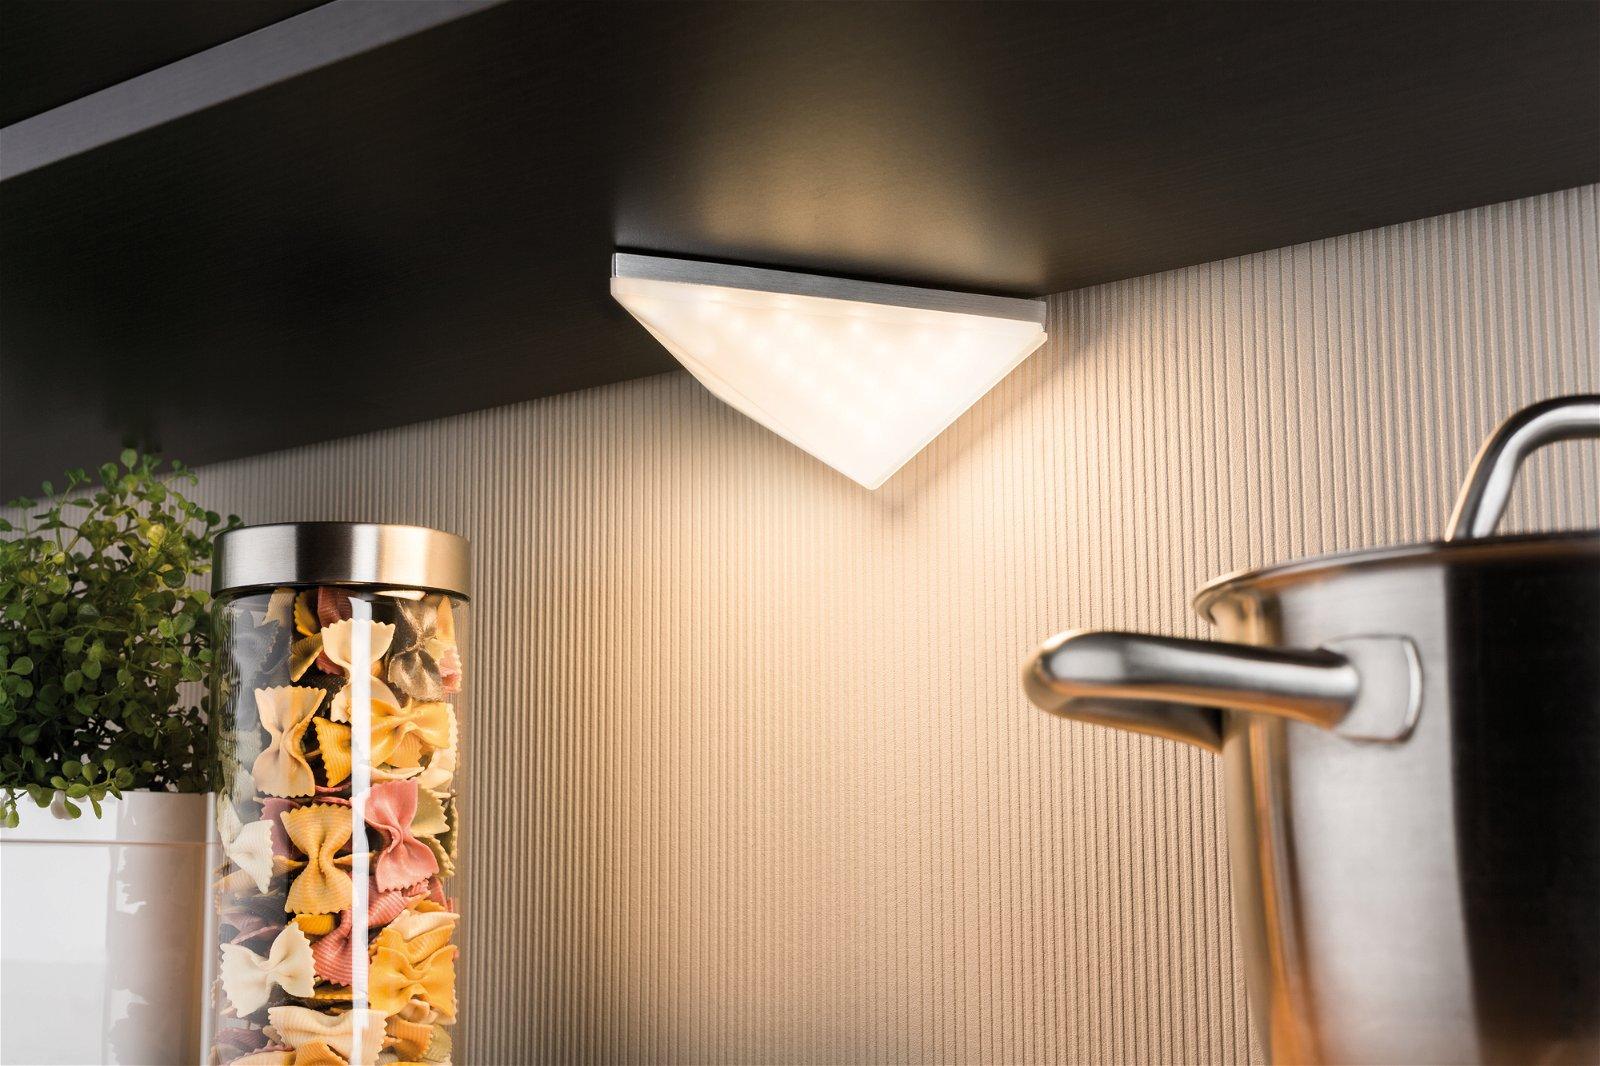 Meubelopbouwlamp LED Kite driehoekig set van 2 inclusief LED-module 2 x 6,2 W